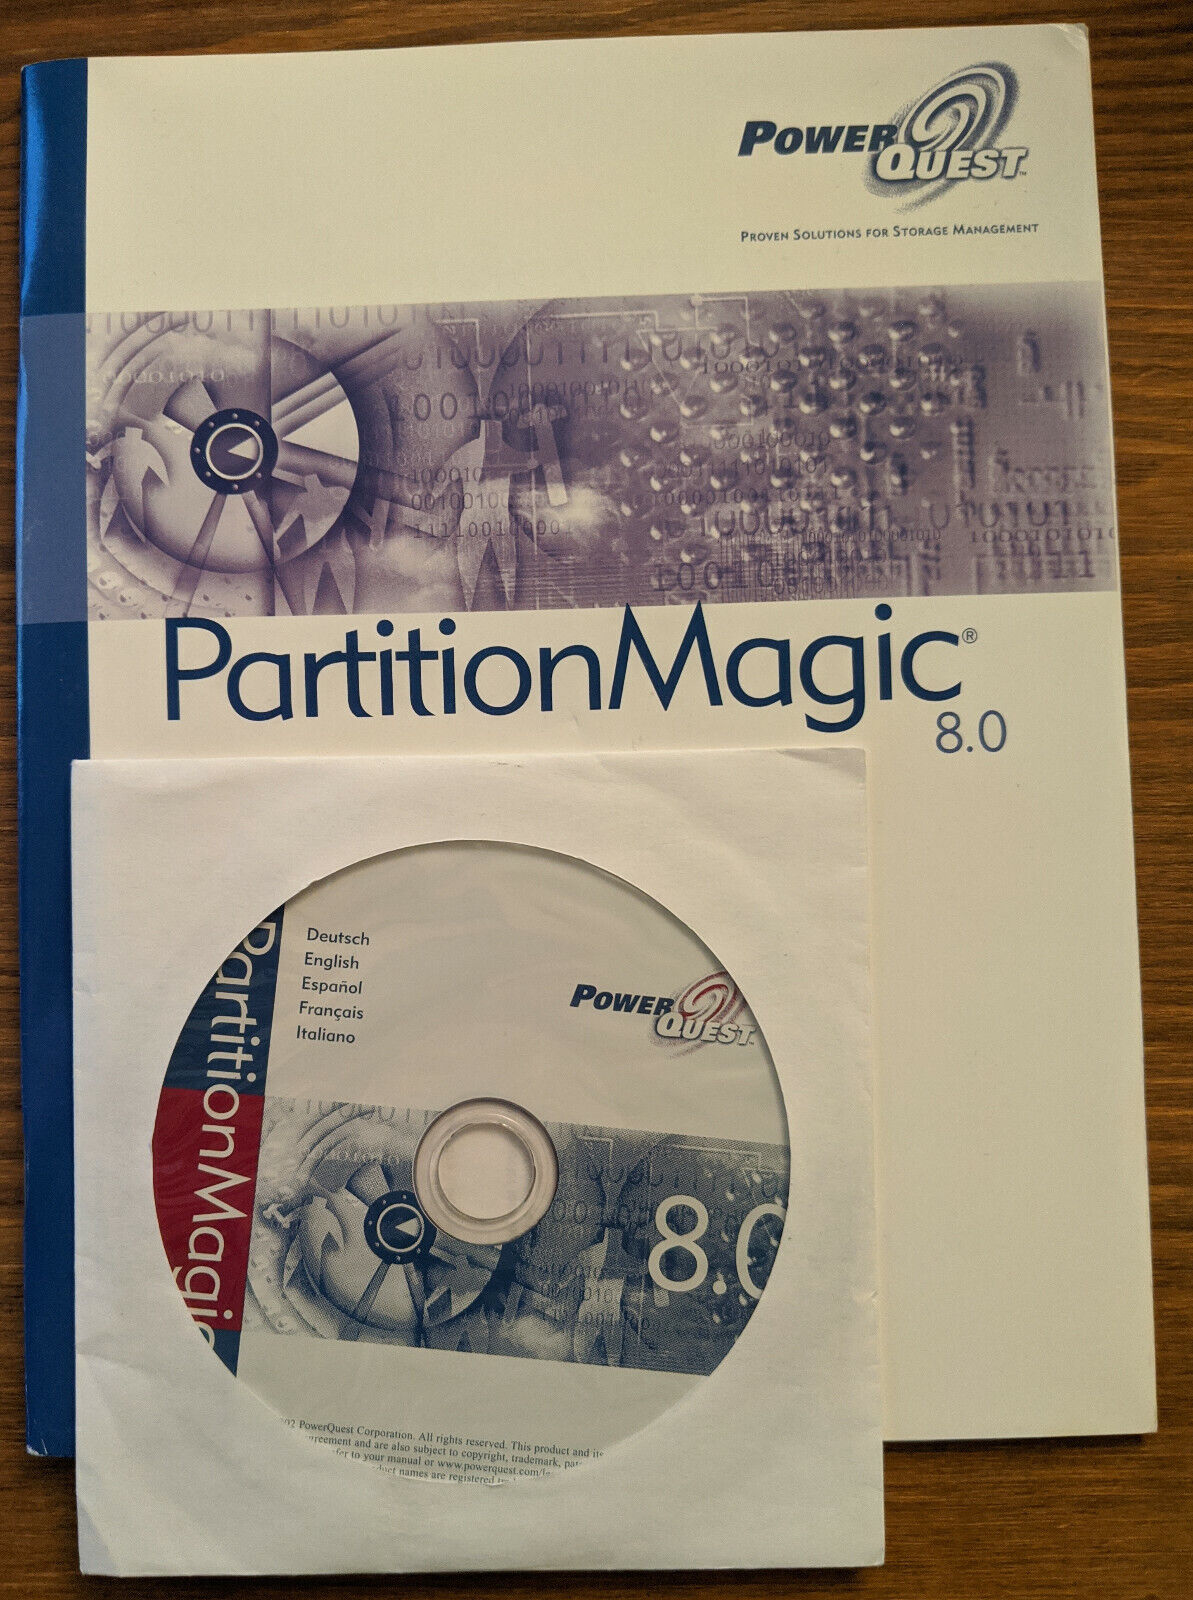 Partition Magic 8.0 - Original CD, User Guide and Serial Number